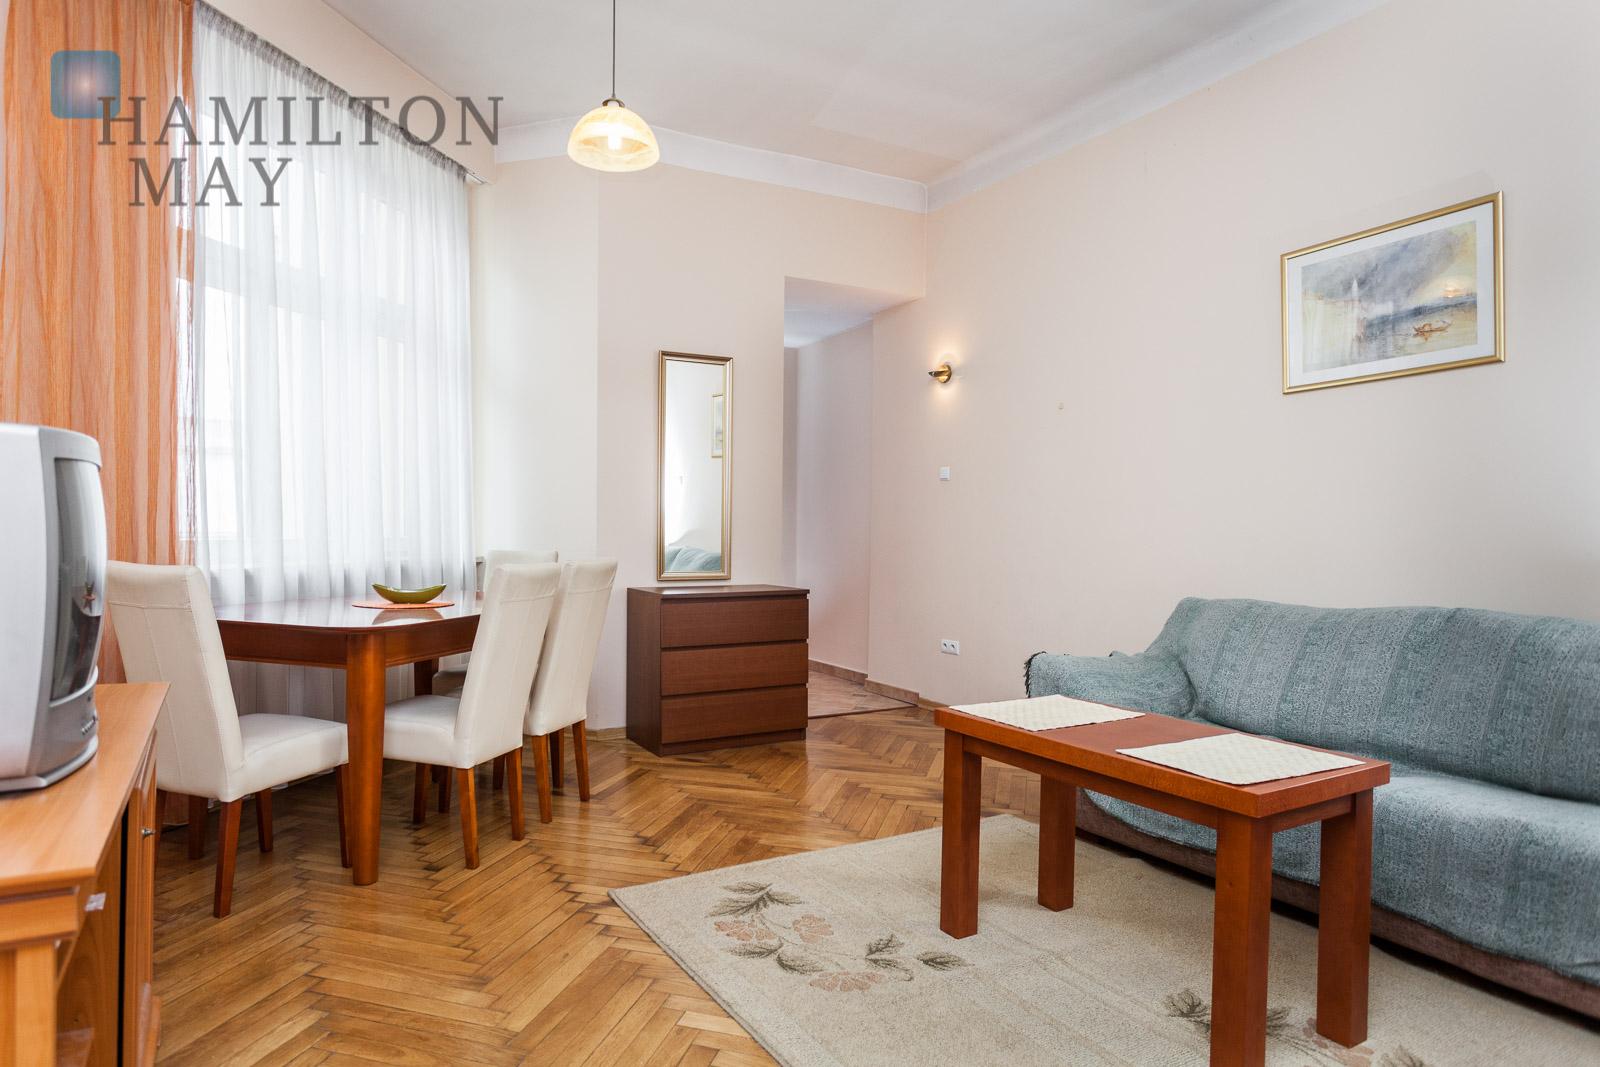 Large 1 bedroom apartment next to Wawel castle Krakow for rent